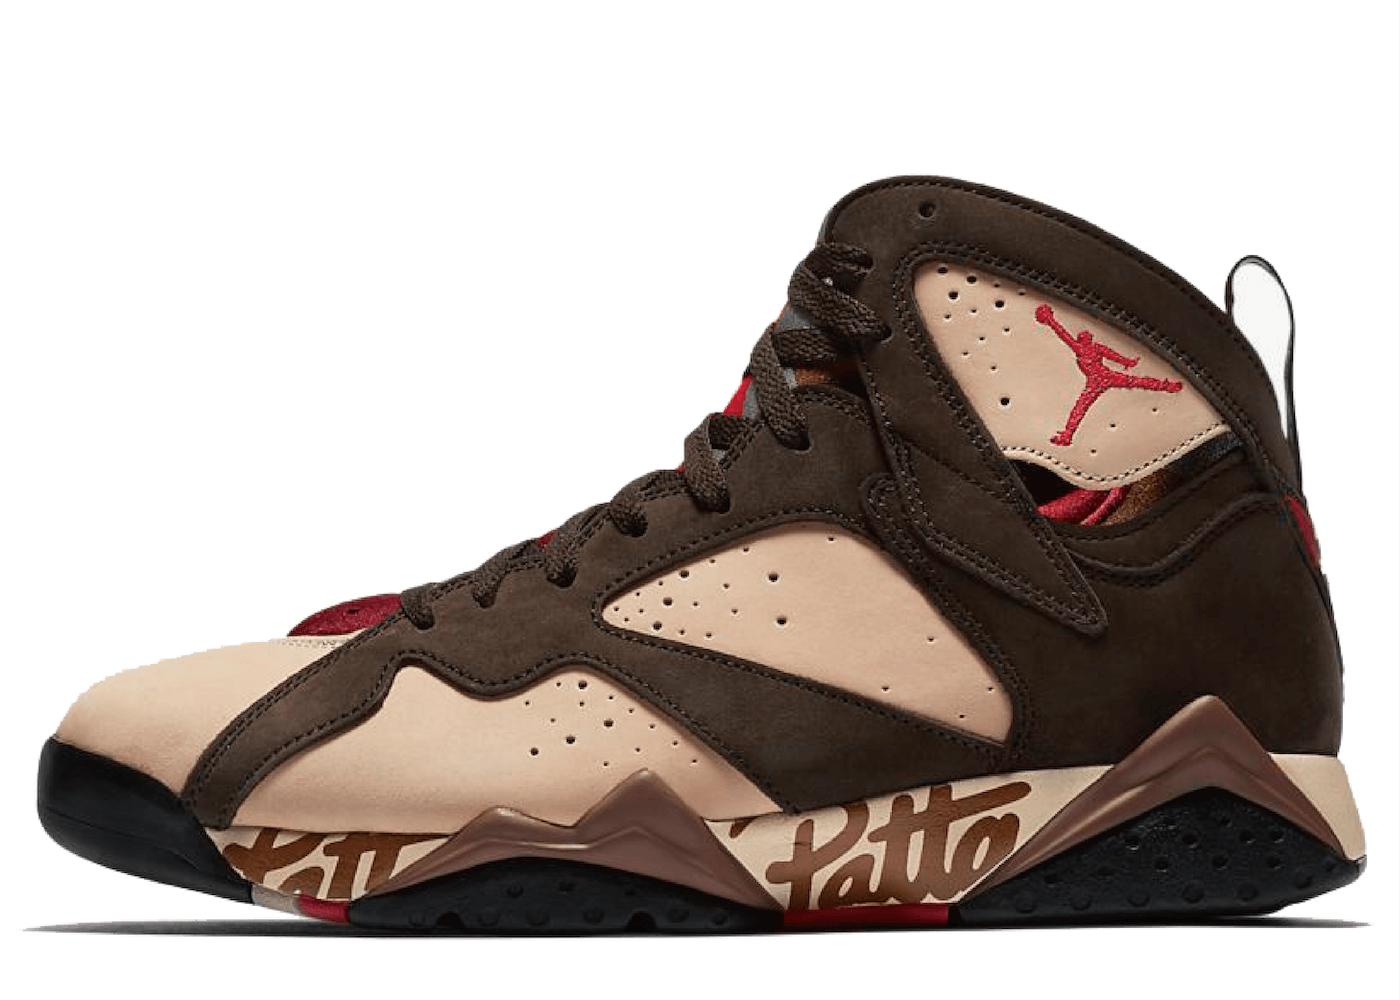 Nike Air Jordan 7 Retro Patta Shimmerの写真